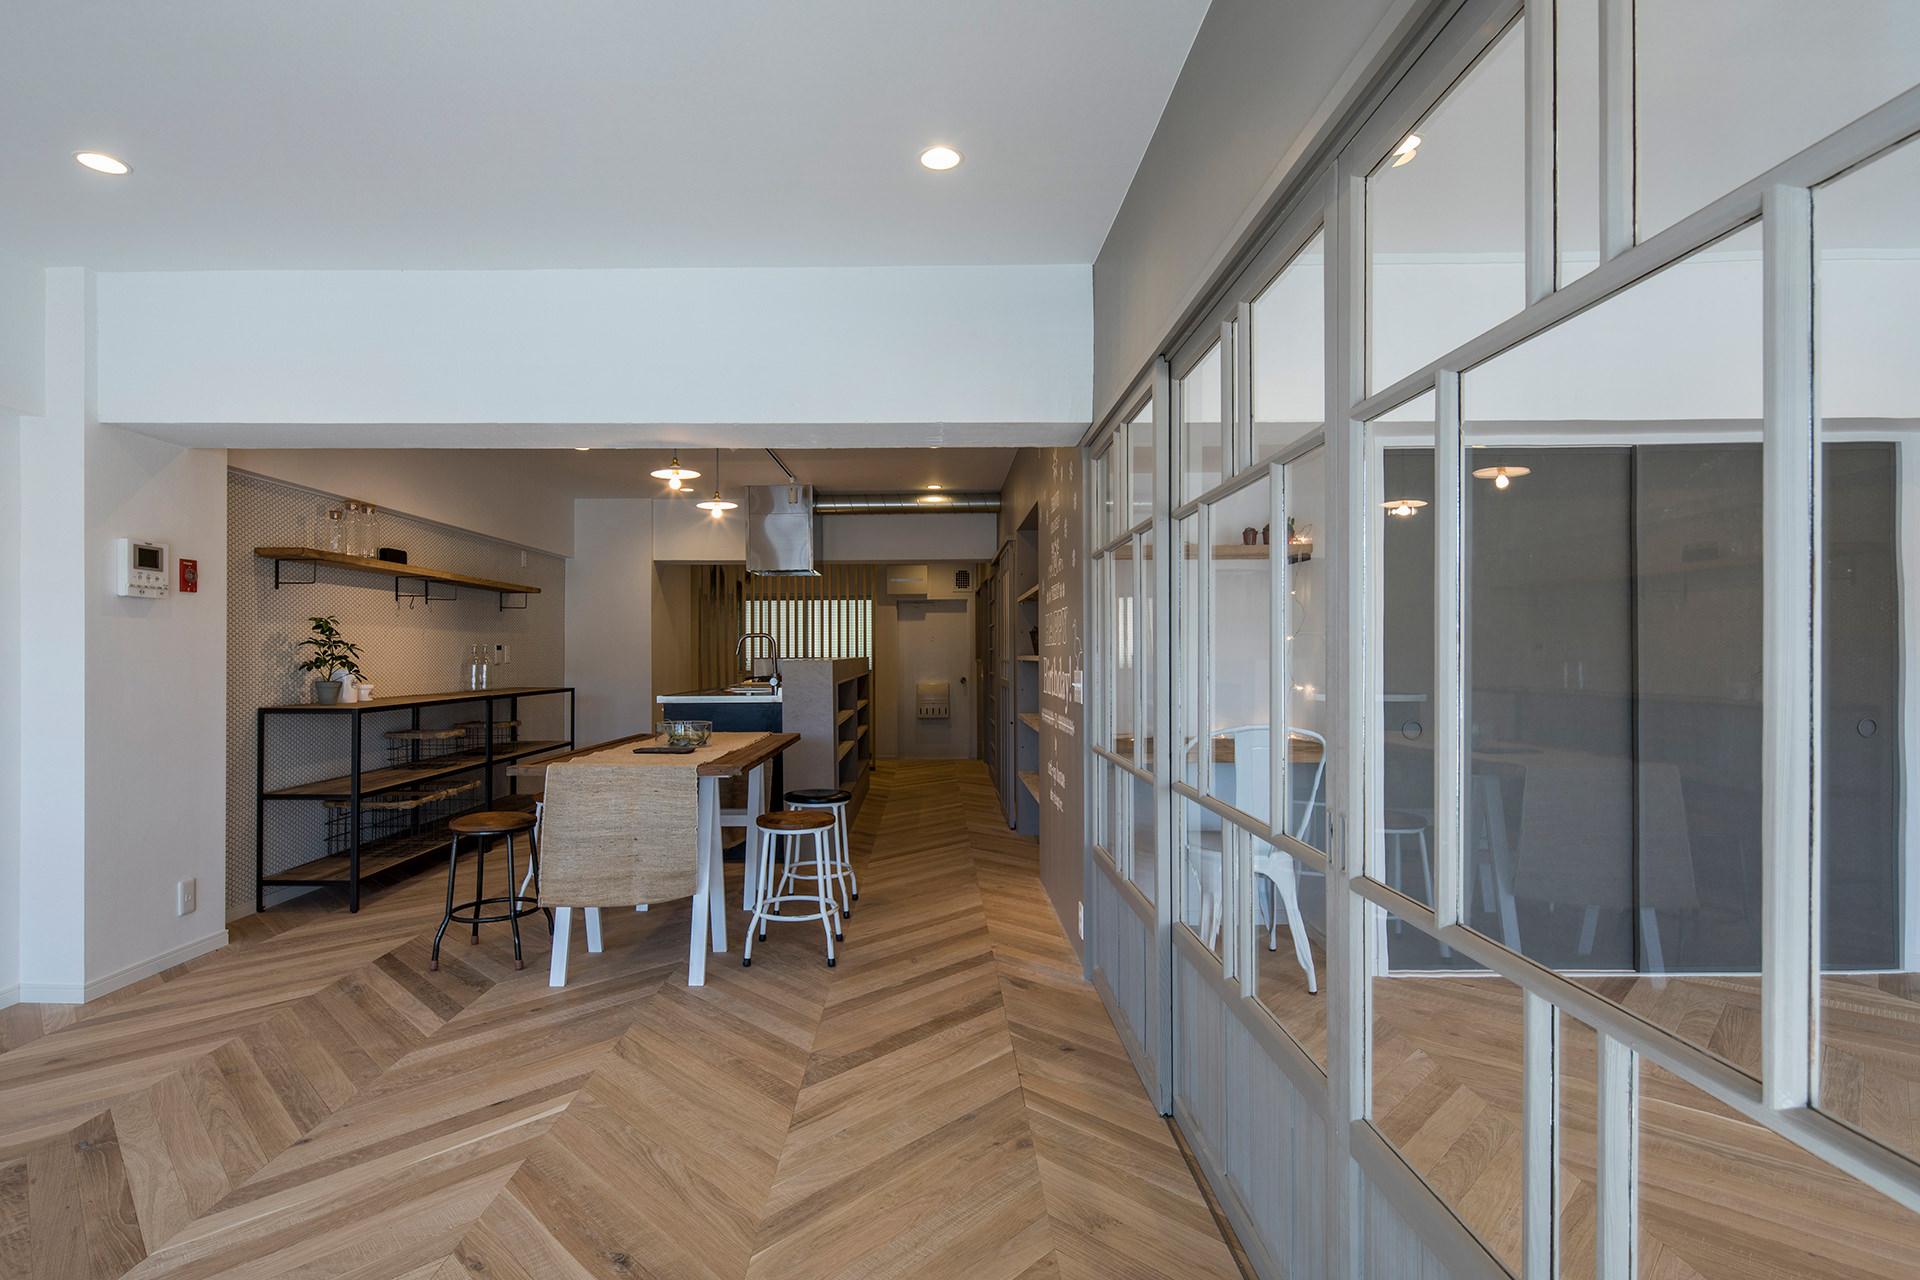 stri-ep house* flat 葉山エコーハイツ  イメージ6 撮影:東涌写真事務所・東涌宏和